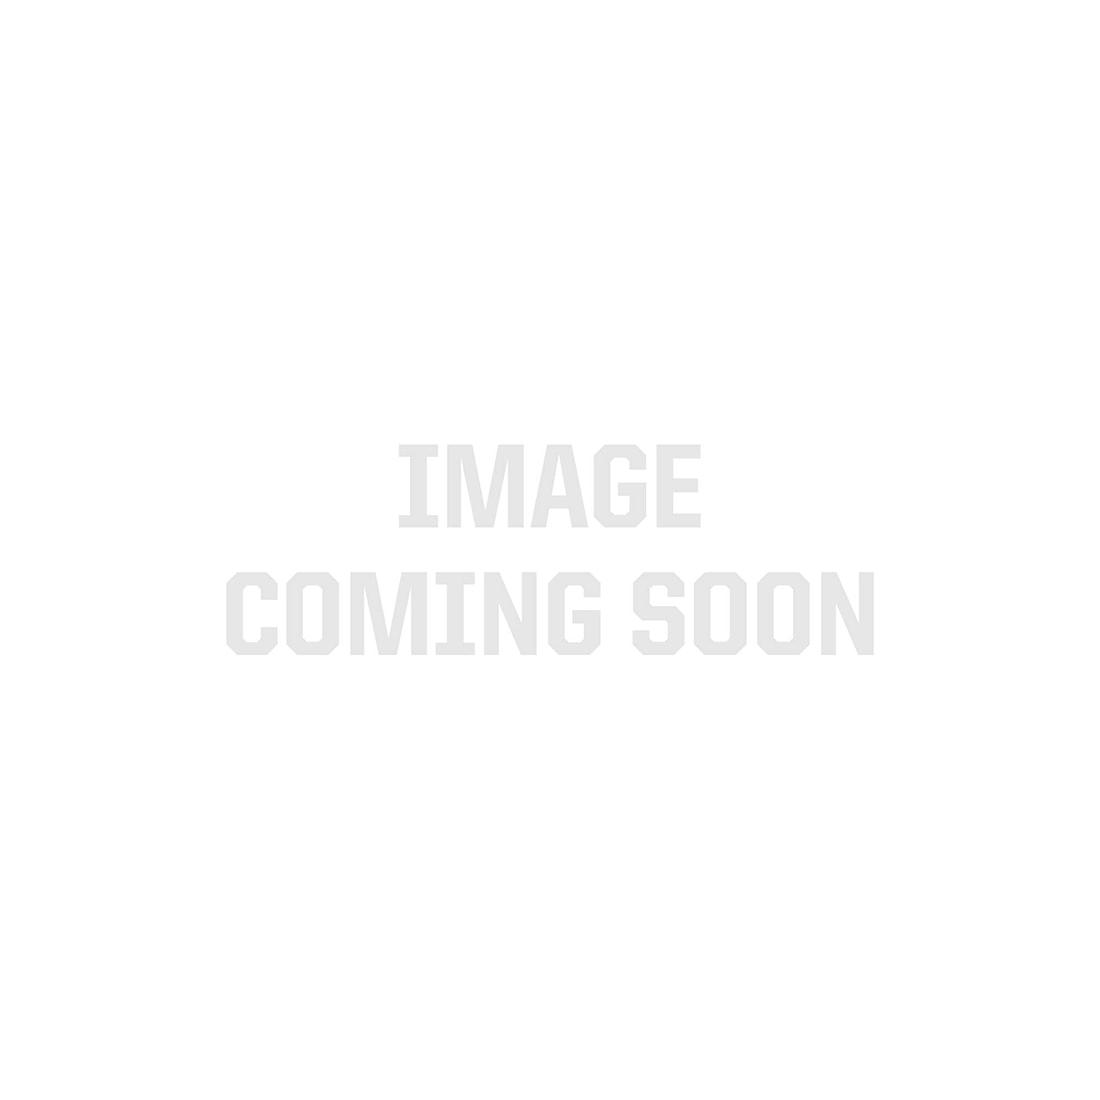 Waterproof Neutral White 2835 Single Row CurrentControl LED Strip Light, 120/m, 10mm wide, Sample Kit